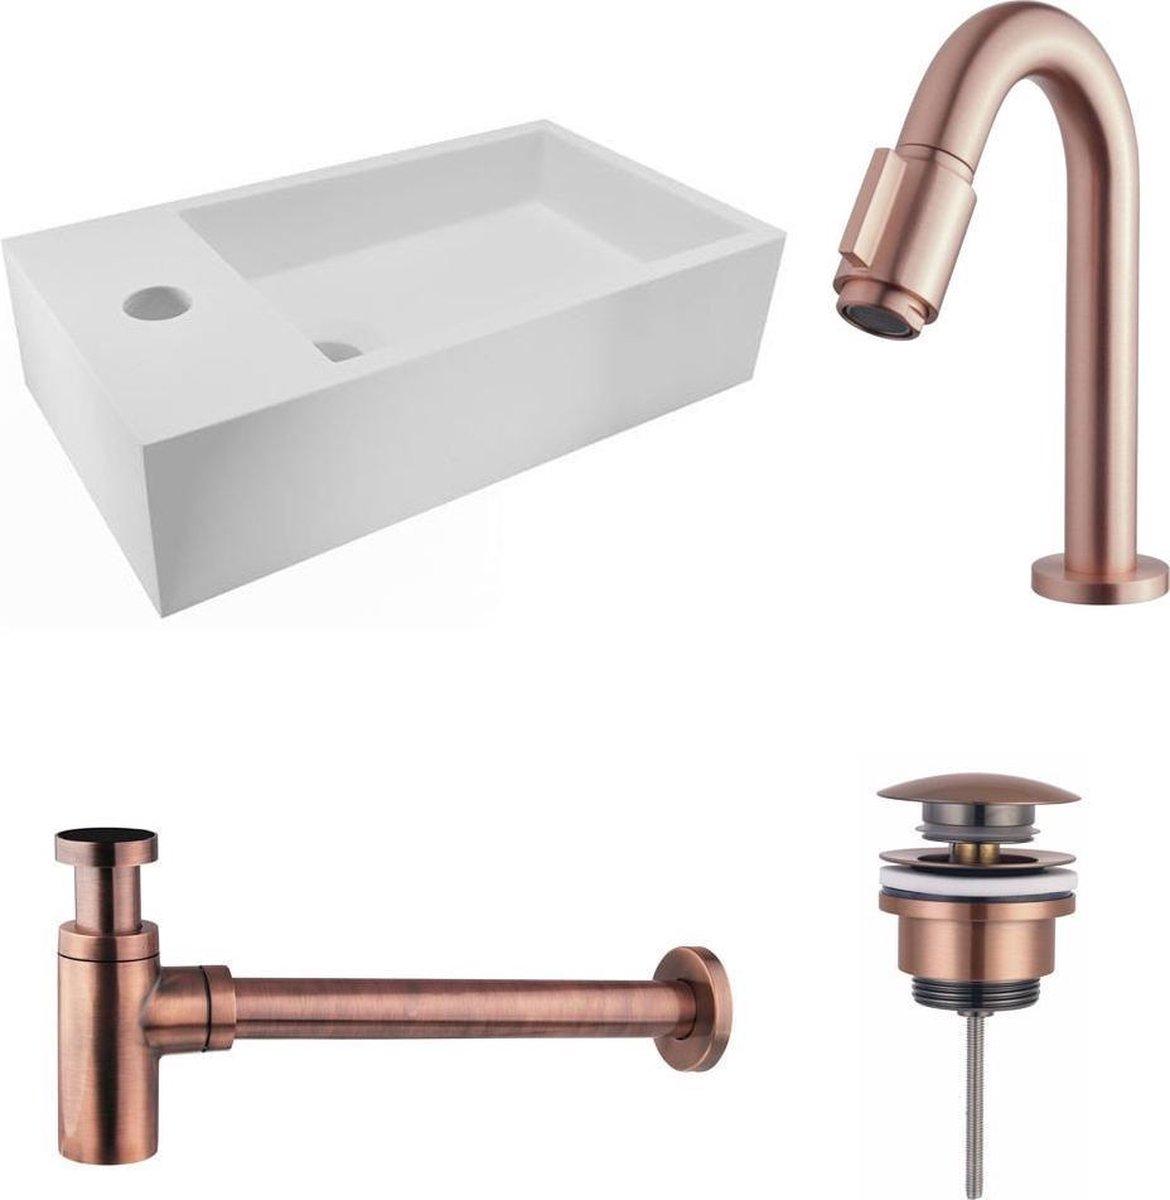 Fonteinset Nila Solid Surface Mat Wit Links 40x22x10cm Toiletkraan Knop Clickwaste Sifon Geborsteld Koper